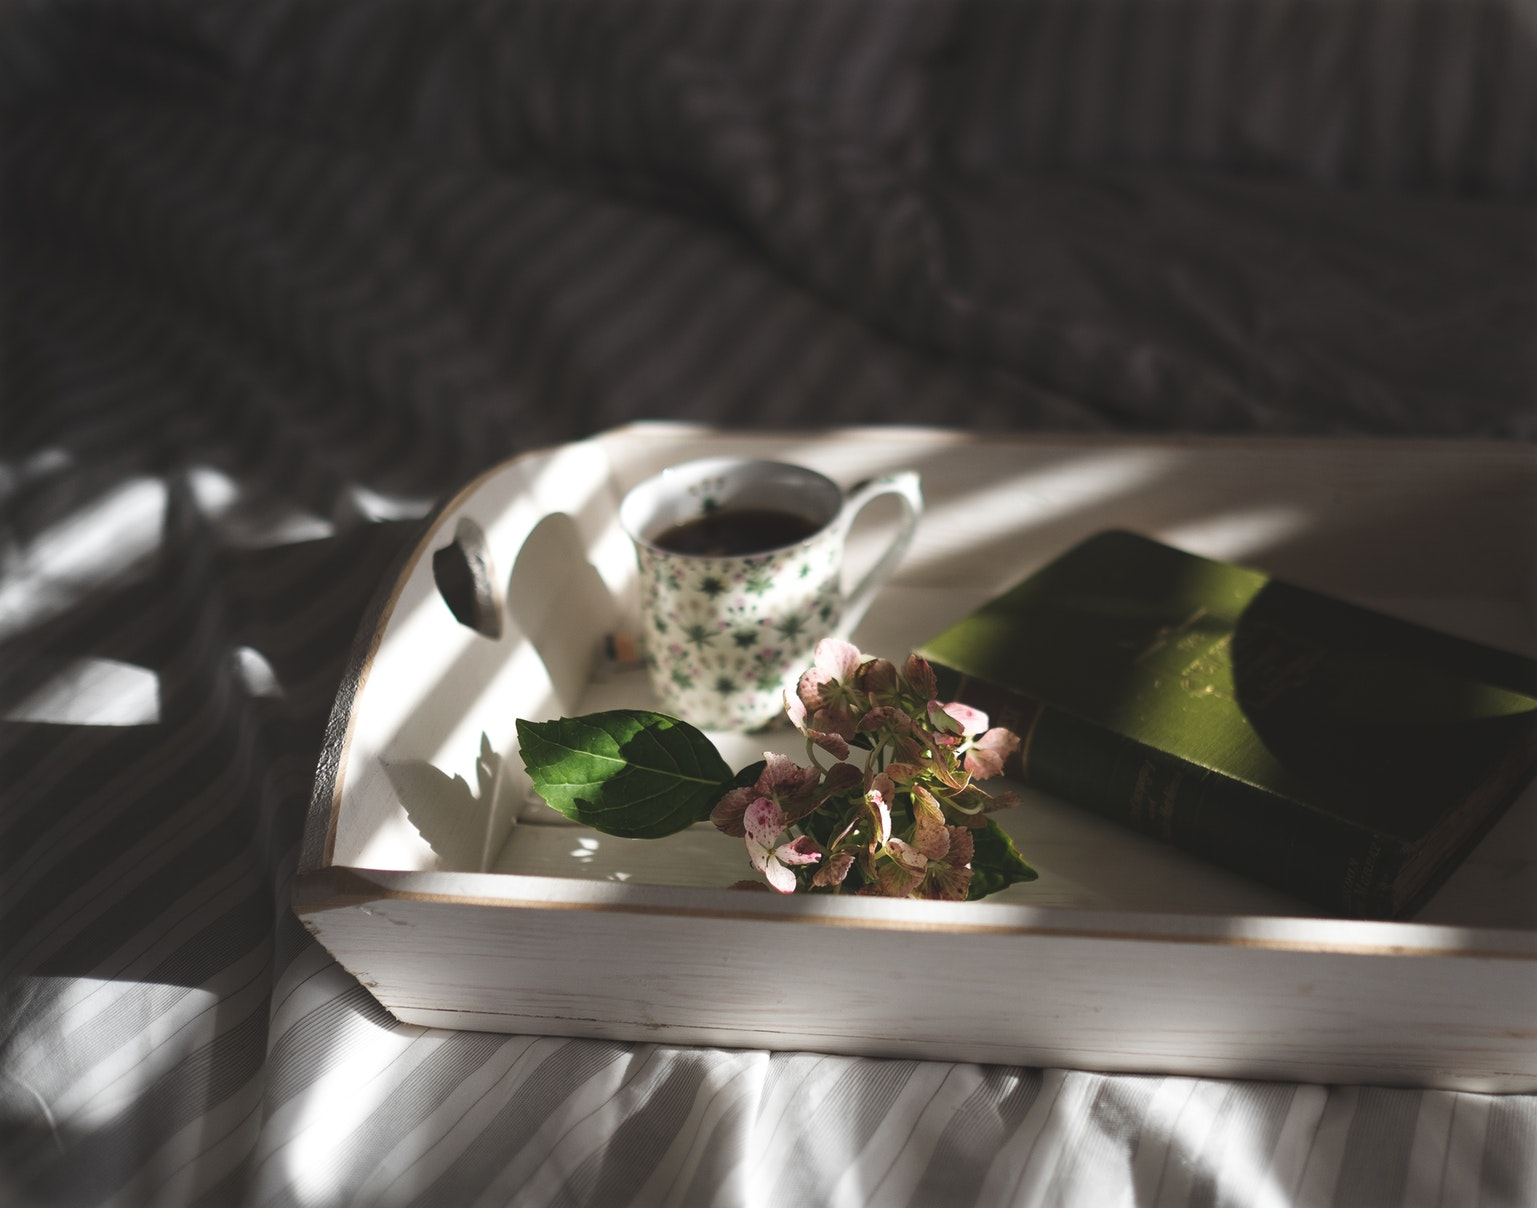 """Tajna kći"" by Kelly Rimmer – Australski domovi, ibsenovski feminizam i priča koju treba razvijati"